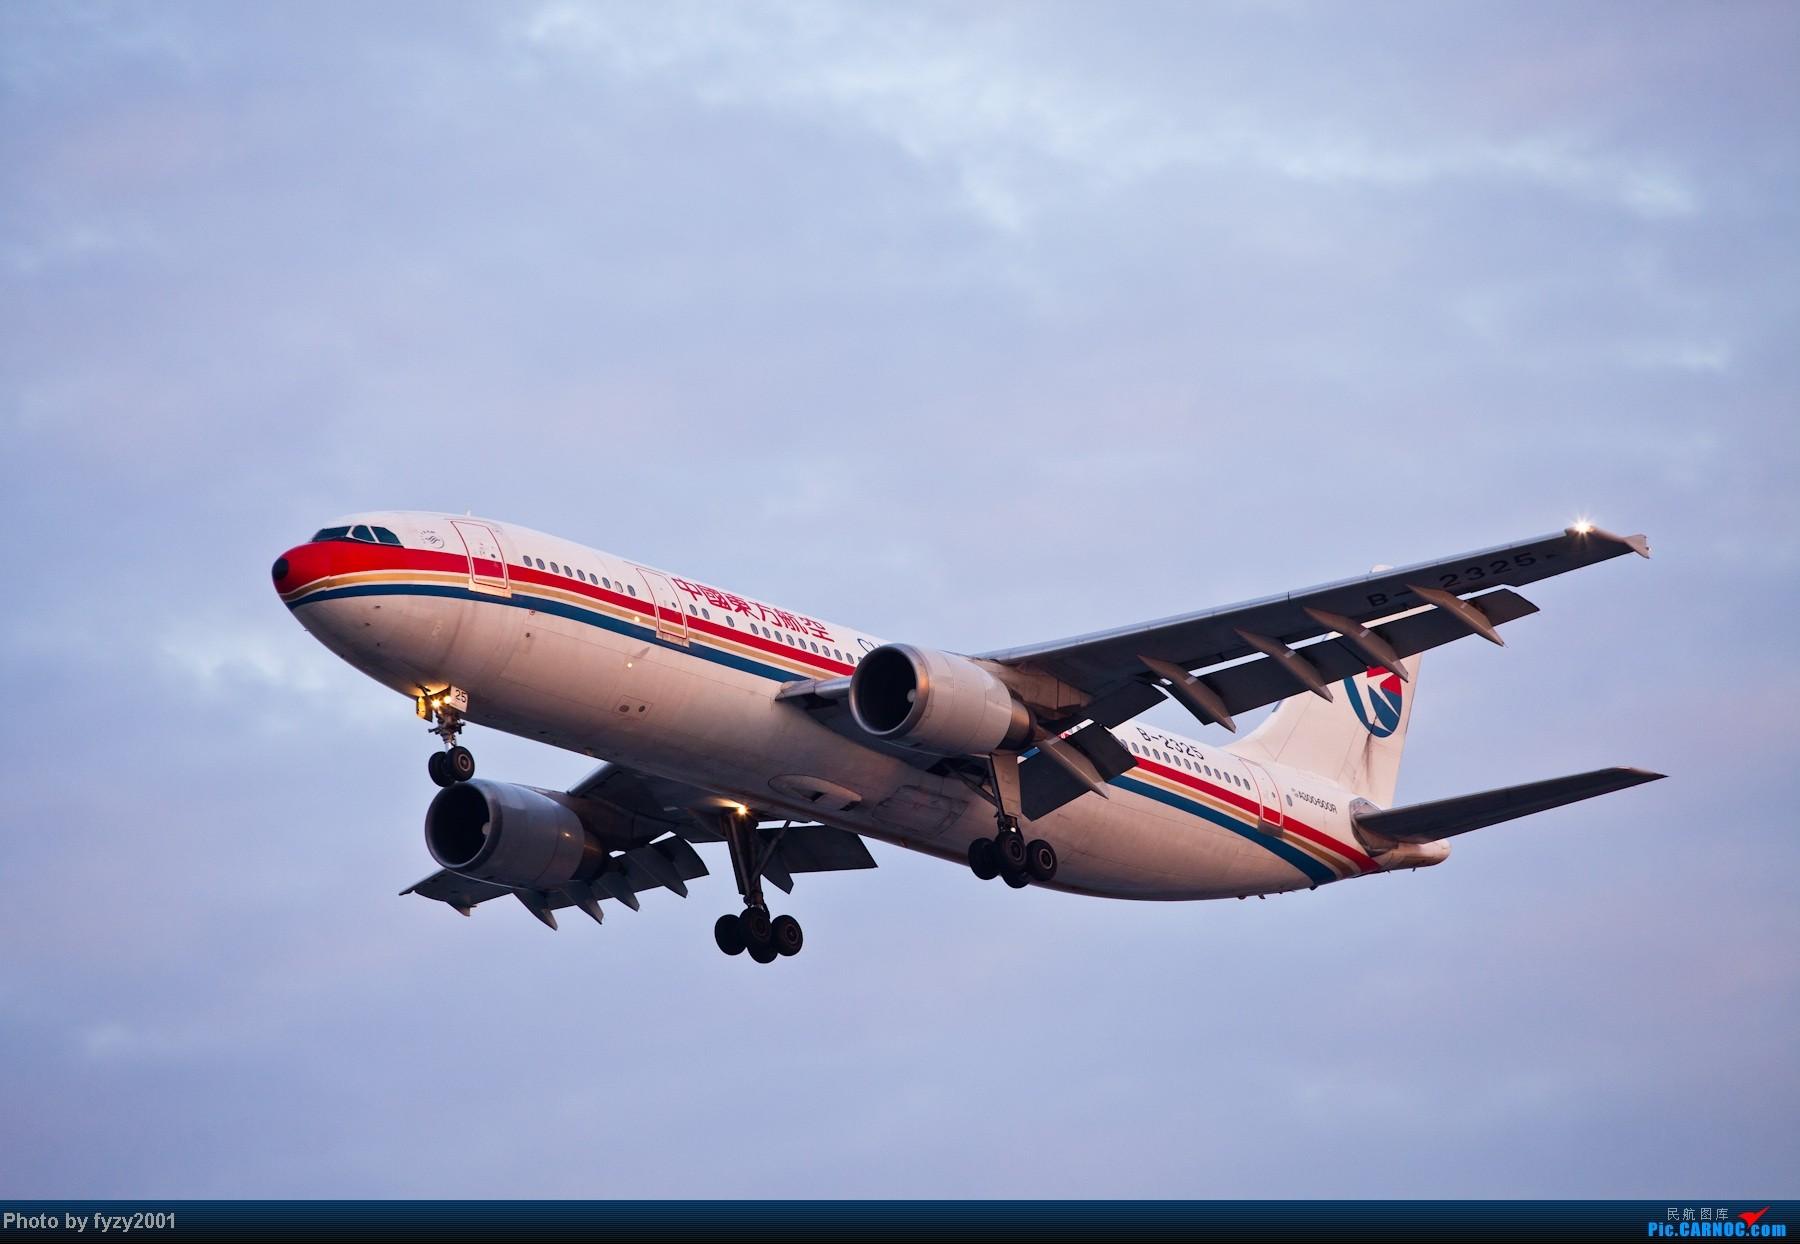 Re:[原创][无锡西站]追逐光影的脚步(1800大图) AIRBUS A300-B4-600 B-2325 中国上海虹桥机场